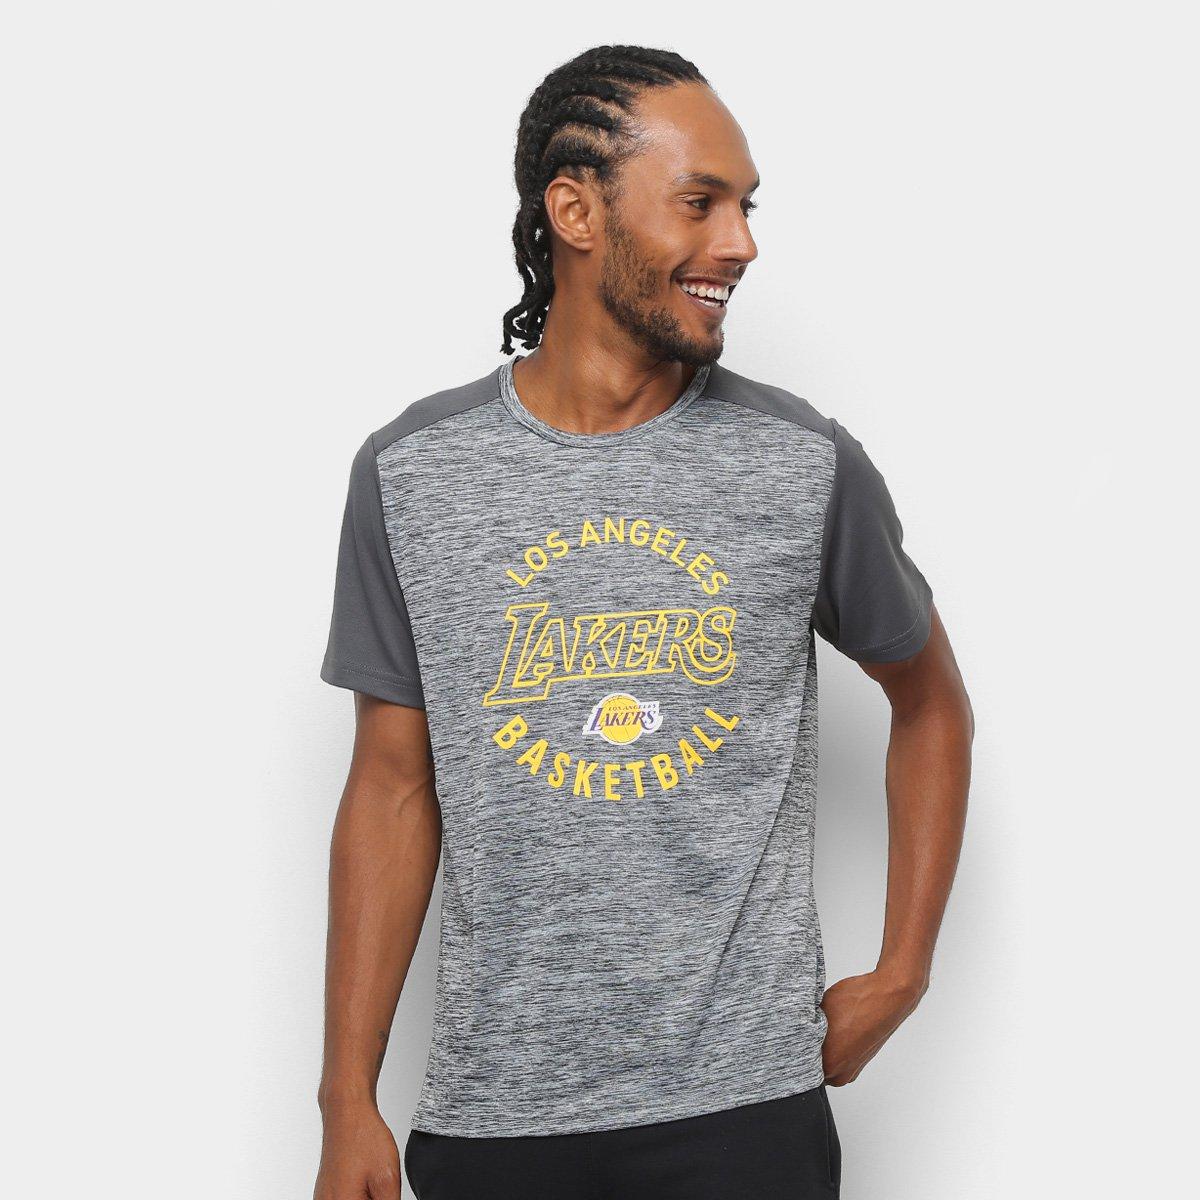 78bd8b0eb Camiseta NBA Los Angeles Lakers 17 Fio Tinto Mesh Masculina - Preto e Cinza  - Compre Agora